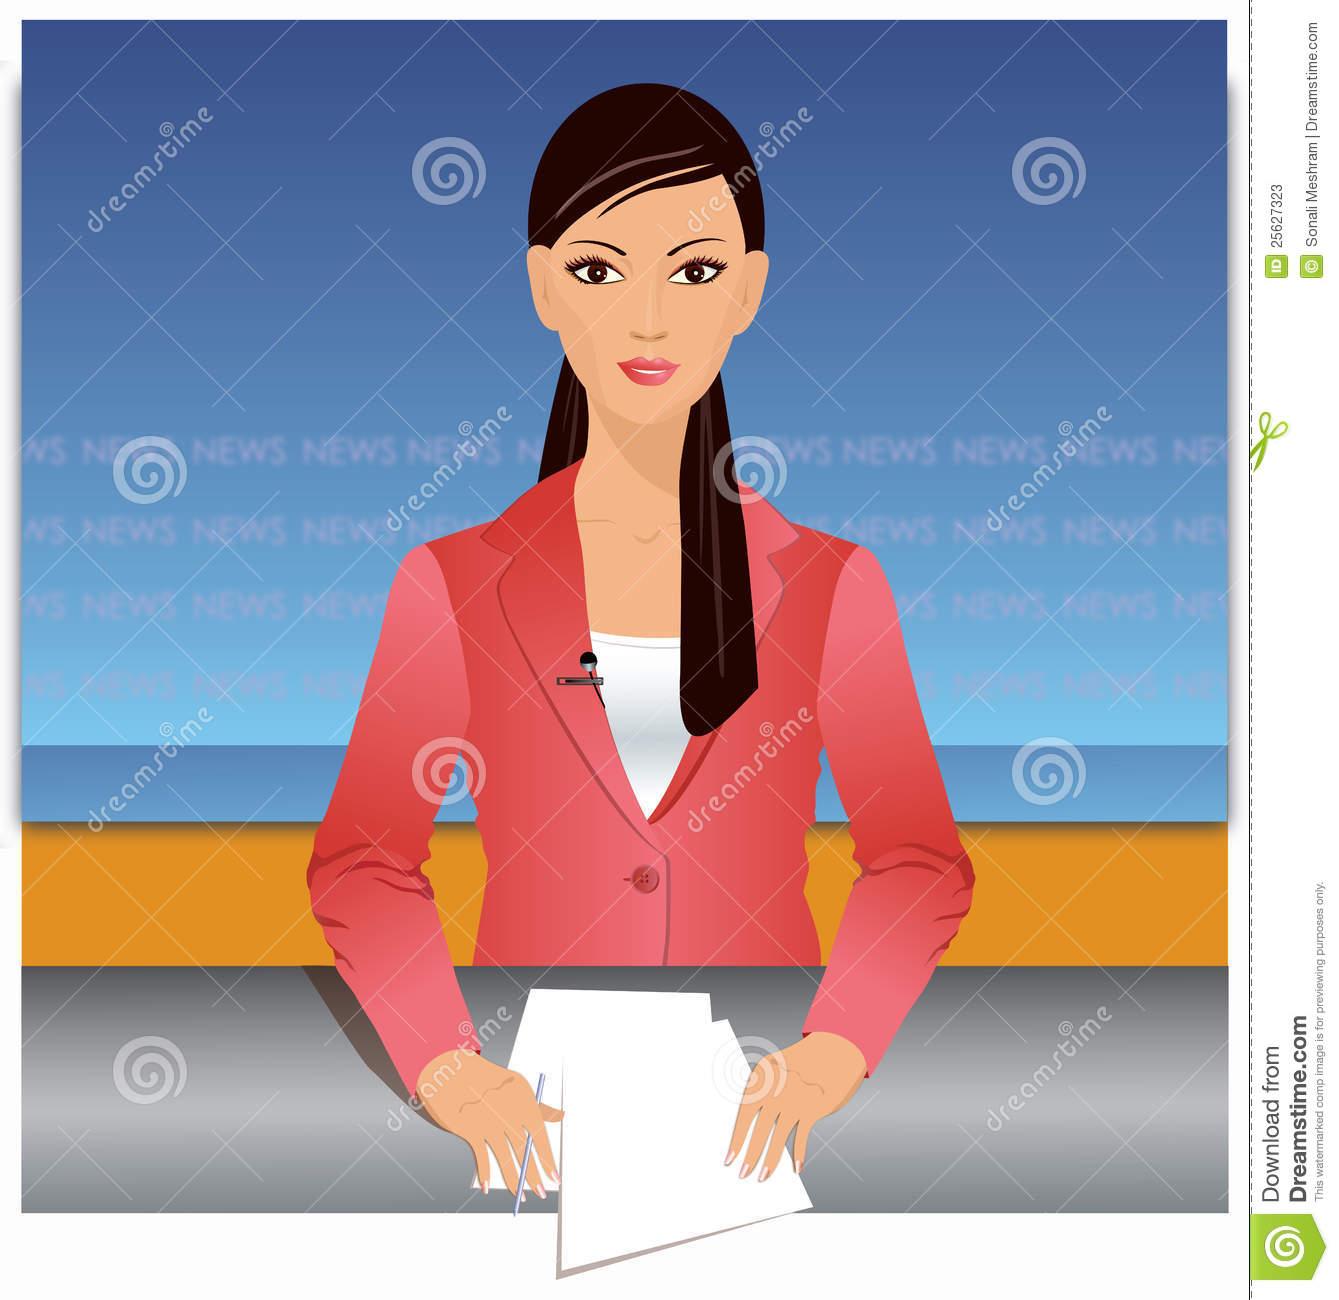 Female News Reporter Clipart.